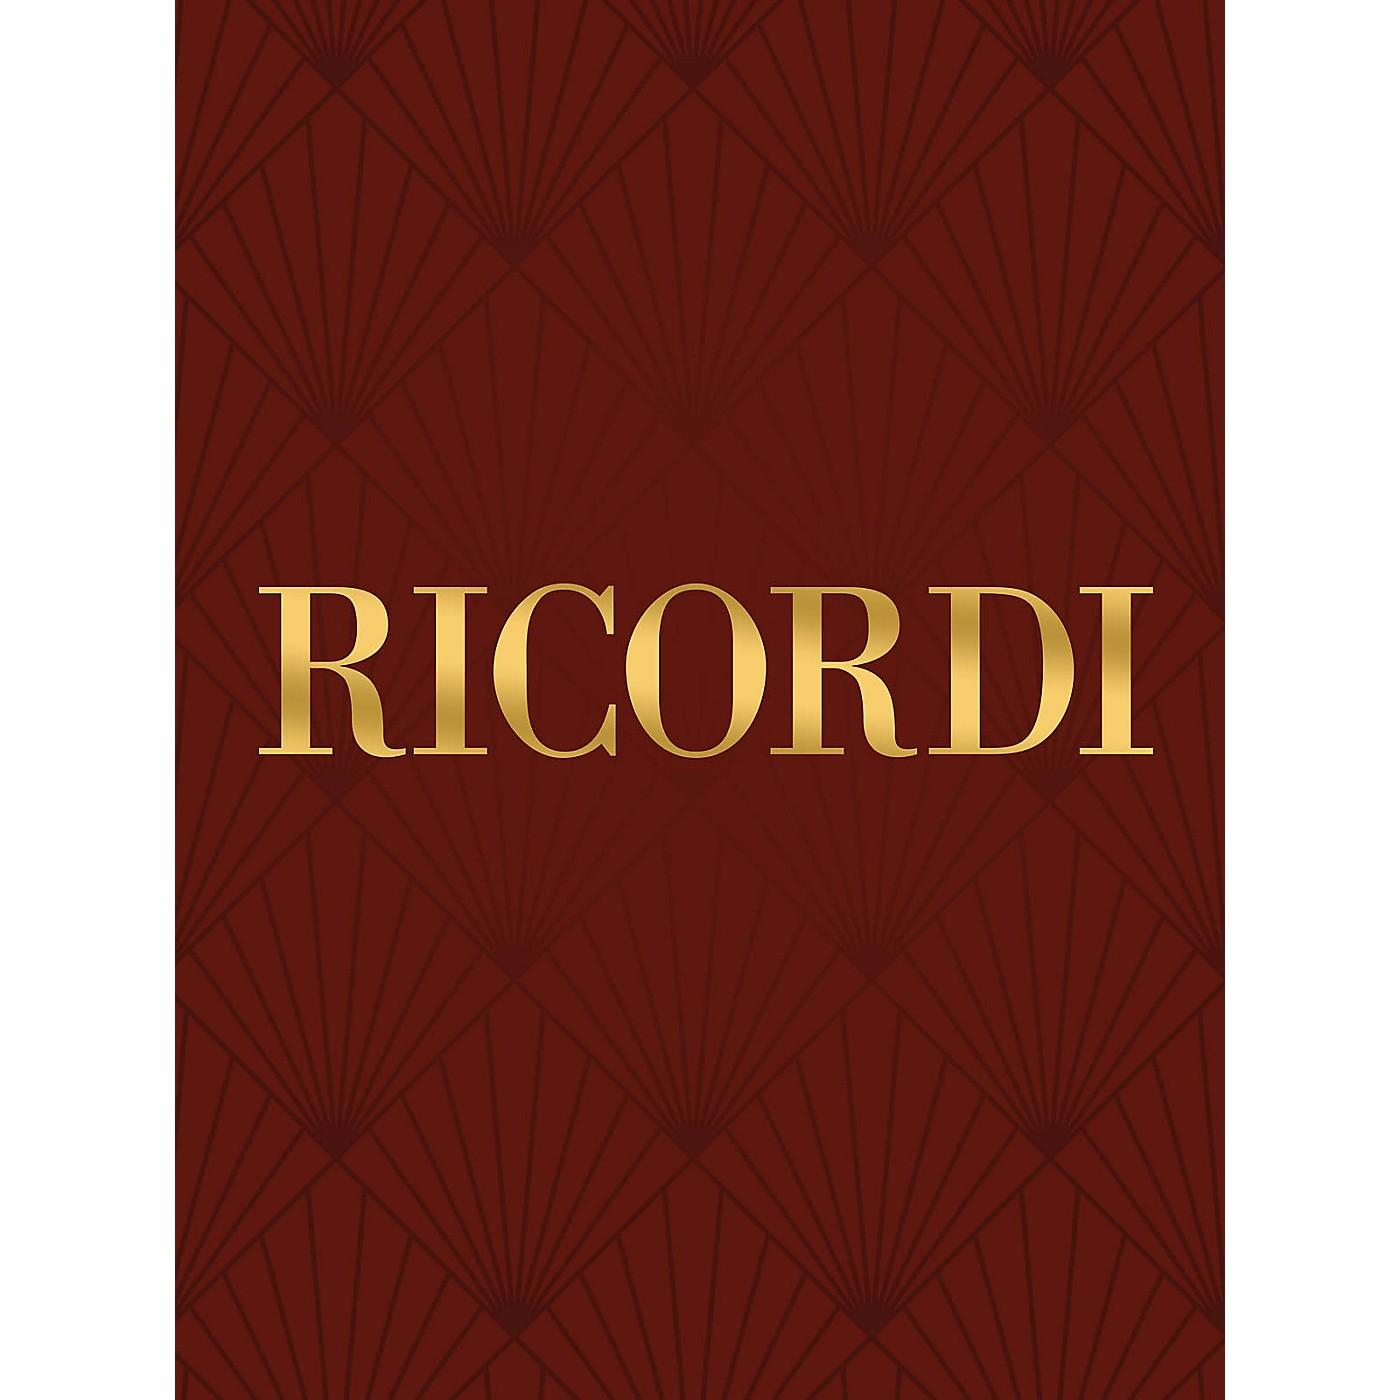 Ricordi La Scuola del Flauto, Op. 51 - Level III Woodwind Method Composed by L Hugues Edited by Alberto Veggetti thumbnail